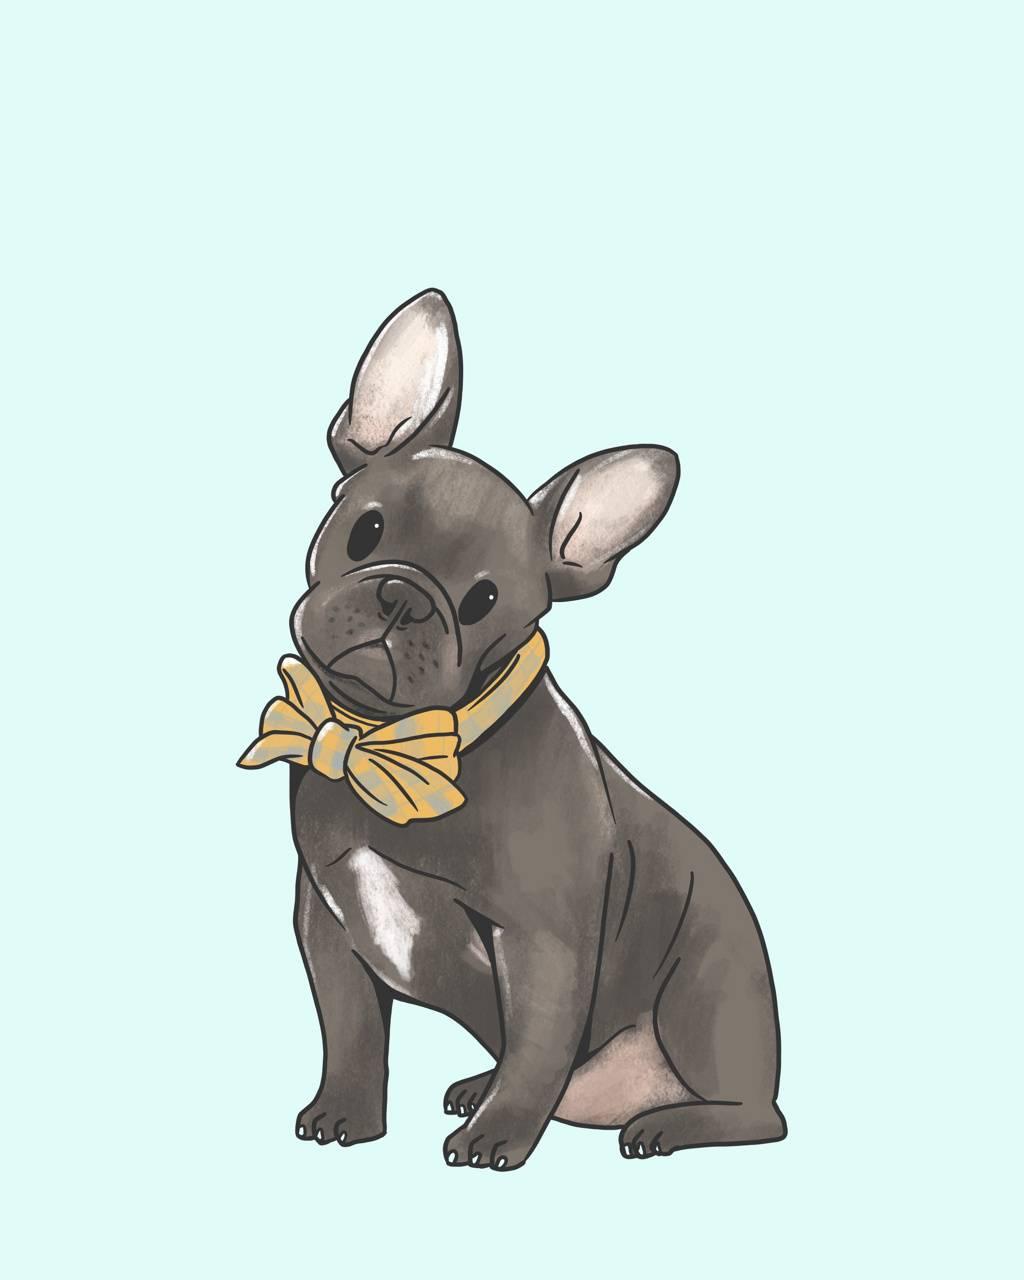 French Bulldog Wallpaper By Scortio Ab Free On Zedge